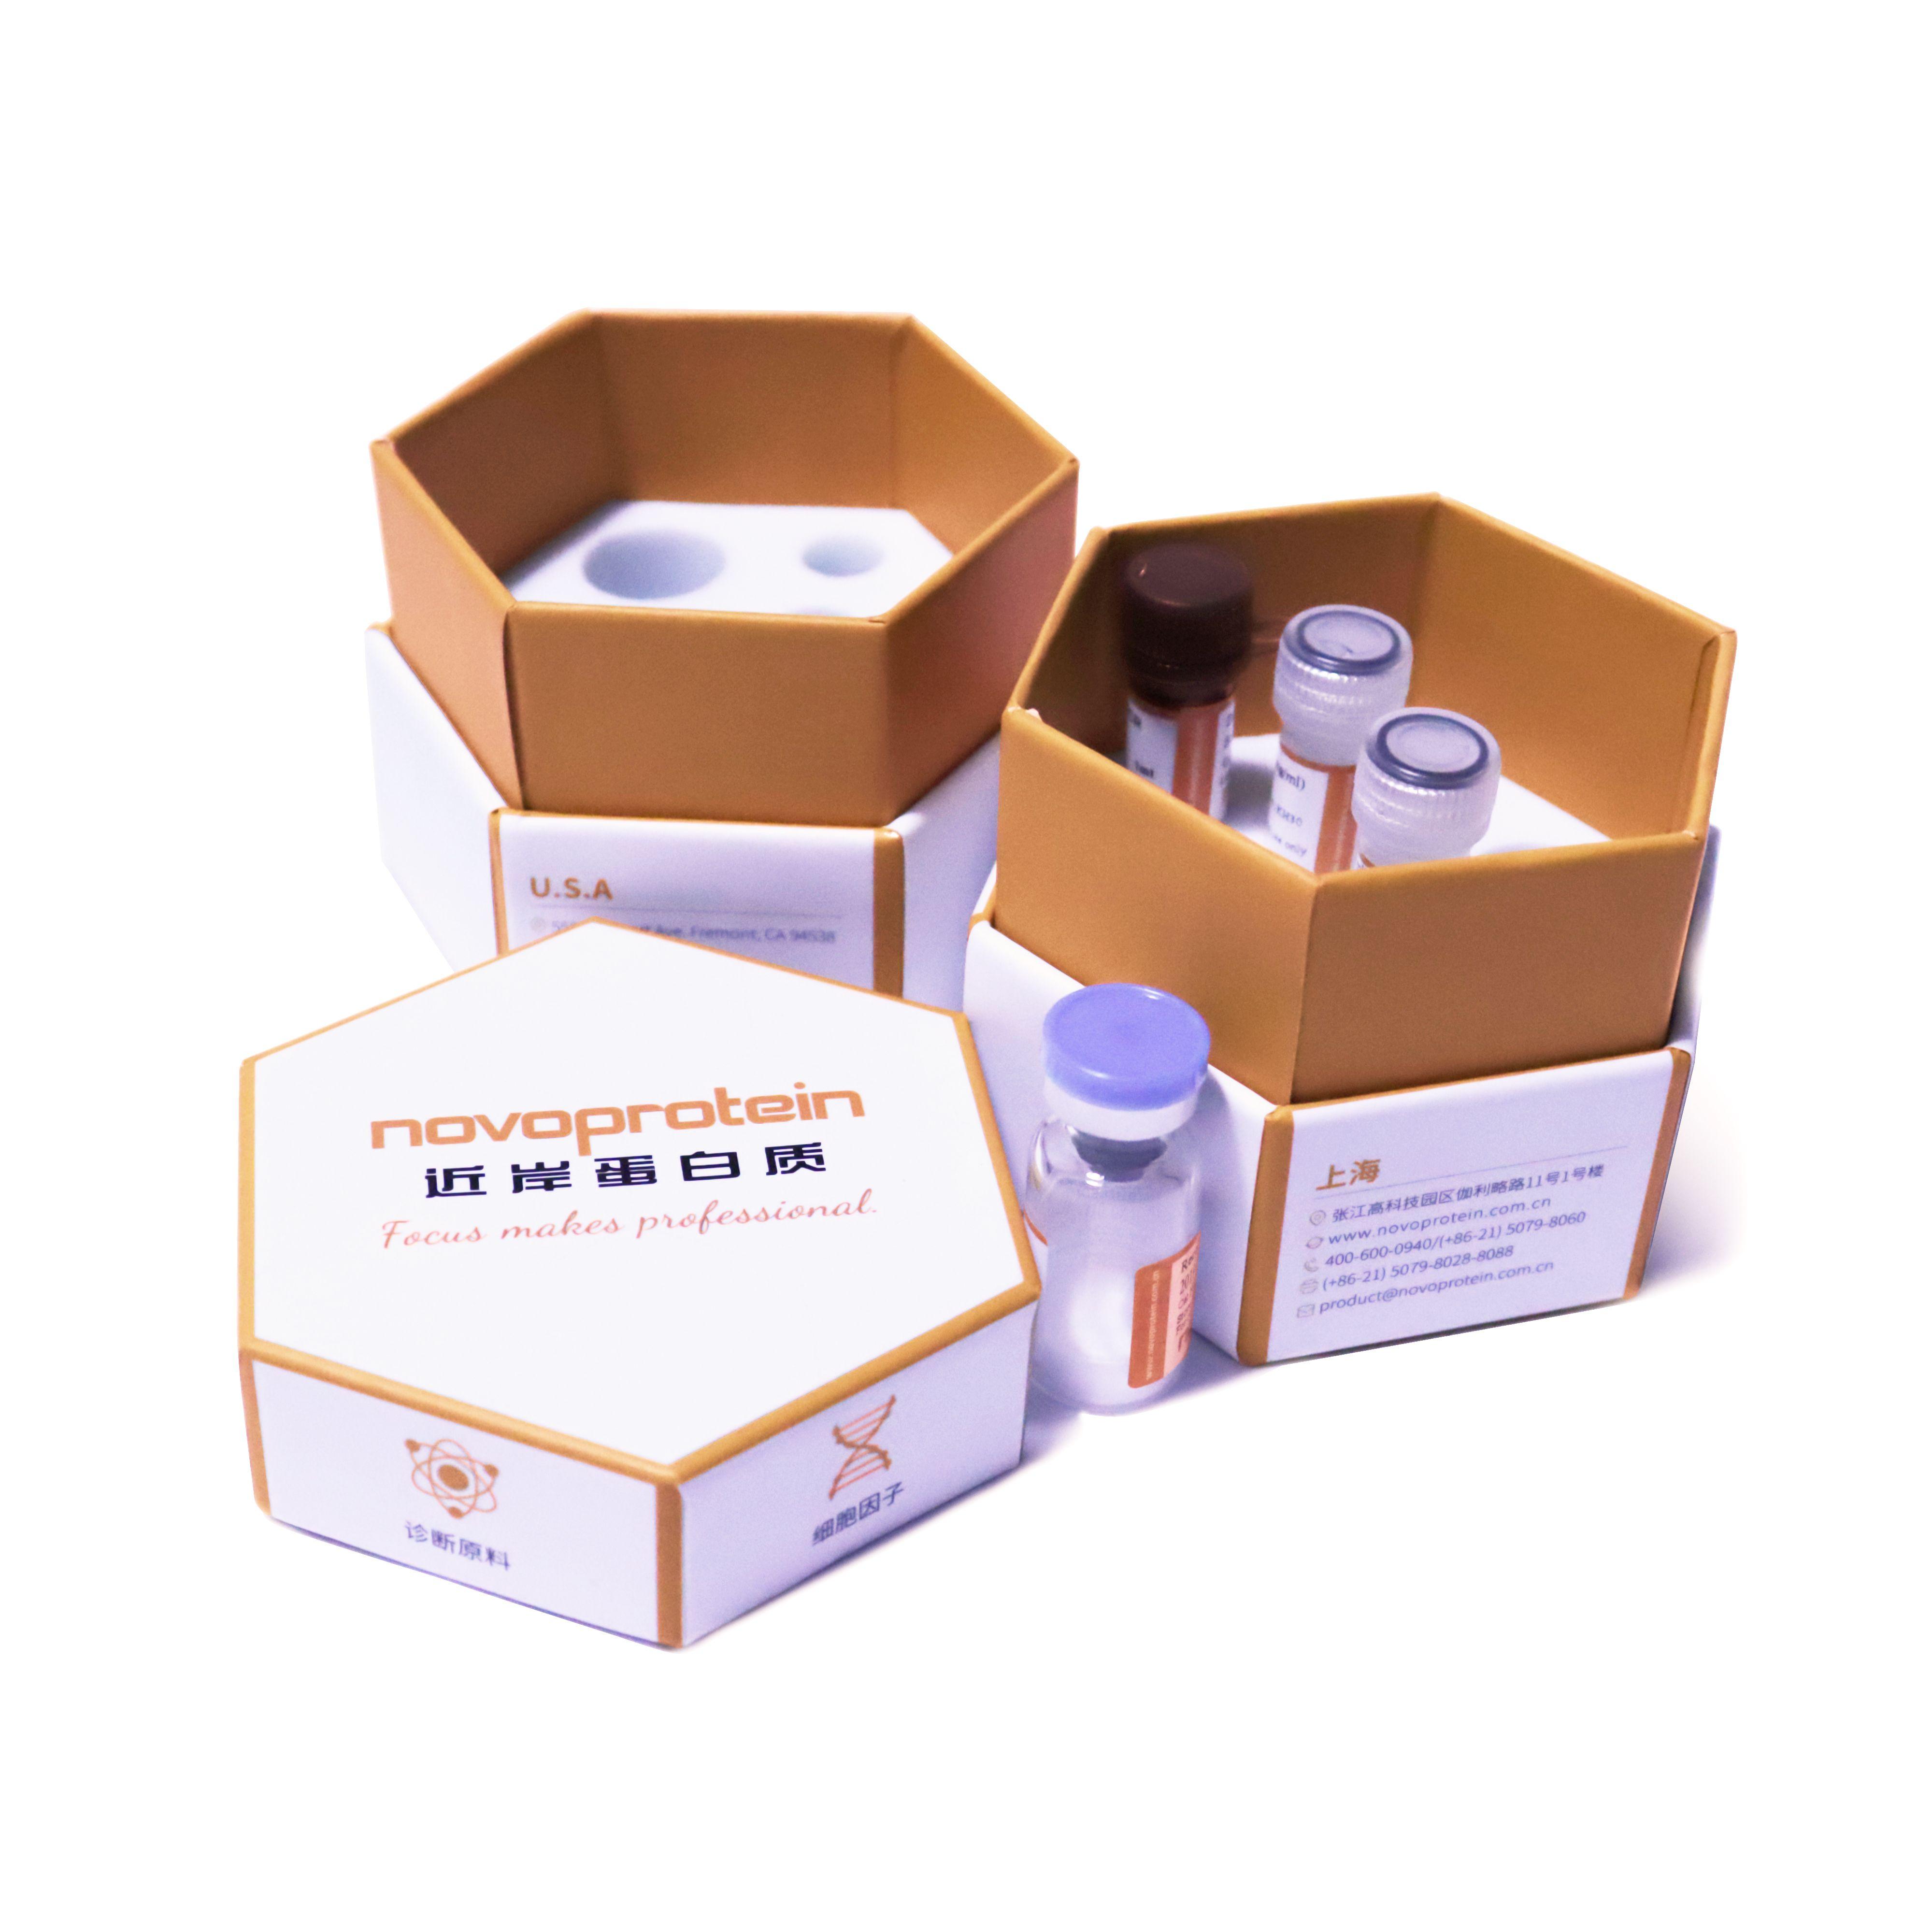 Recombinant Human E-Cadherin/Cadherin-1/CDH1/CD324